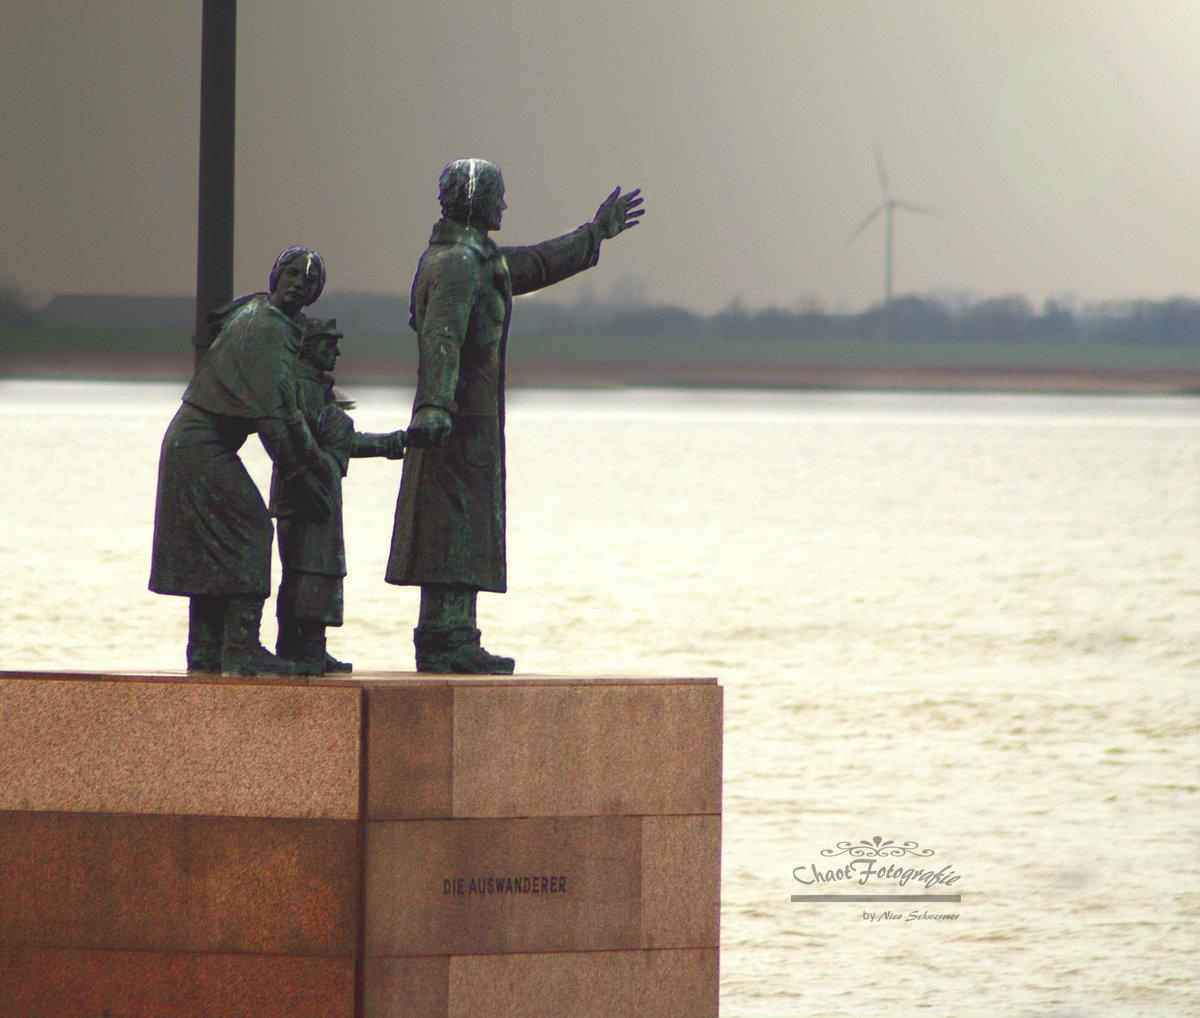 Auswandererdenkmal #Bremerhaven #WillyBrandtPlatz pic.twitter.com/OJ45hYiT6D